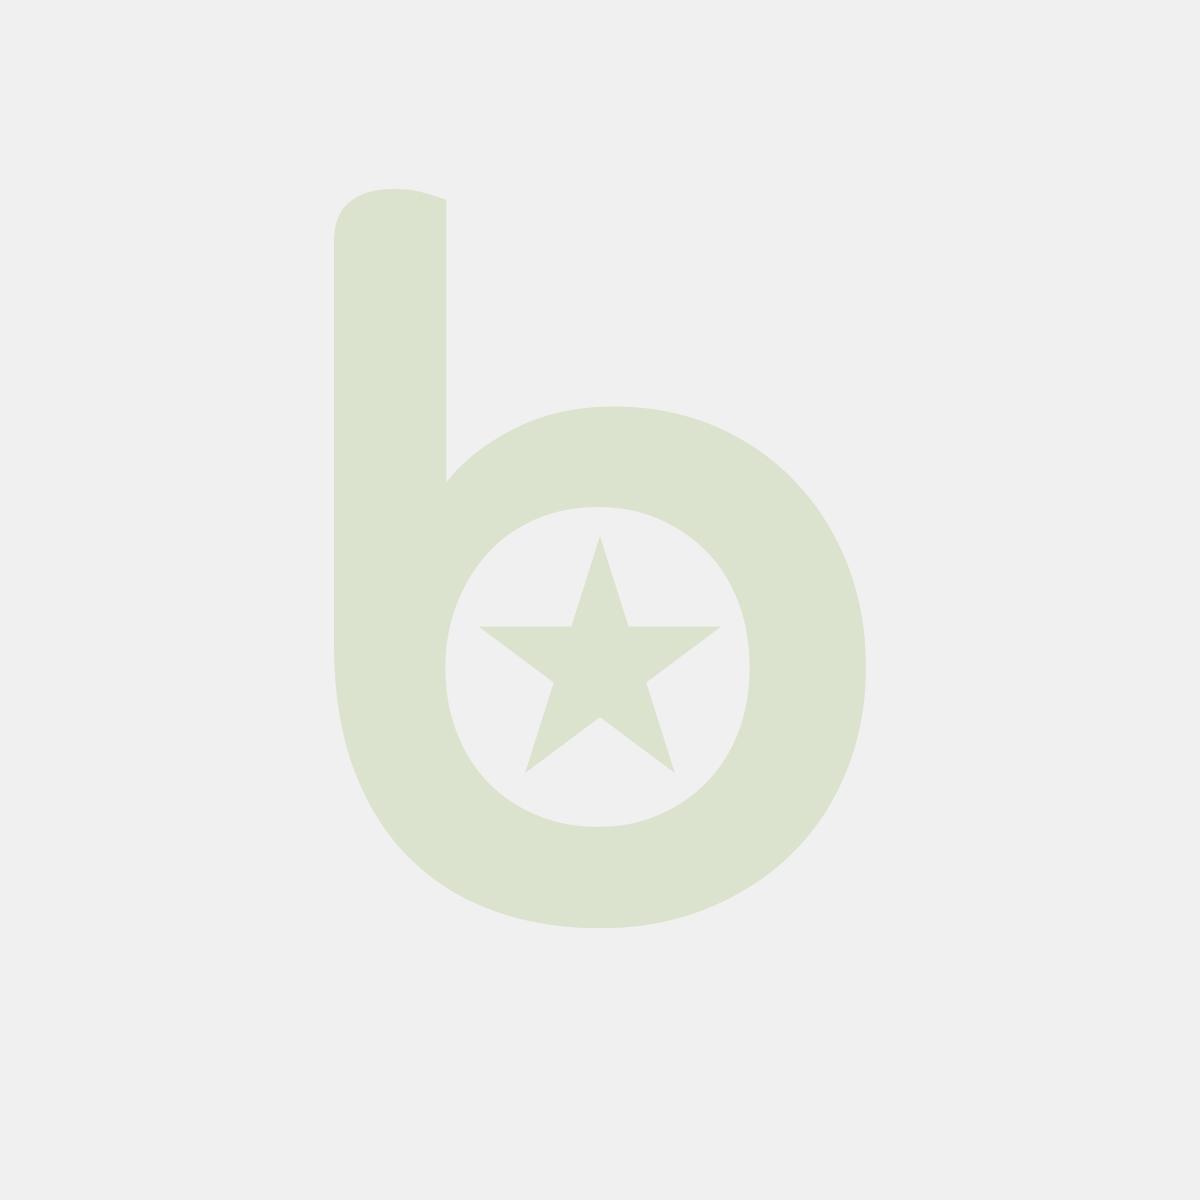 Obrus PAPSTAR Royal Collection 5m/1,18m oliwka